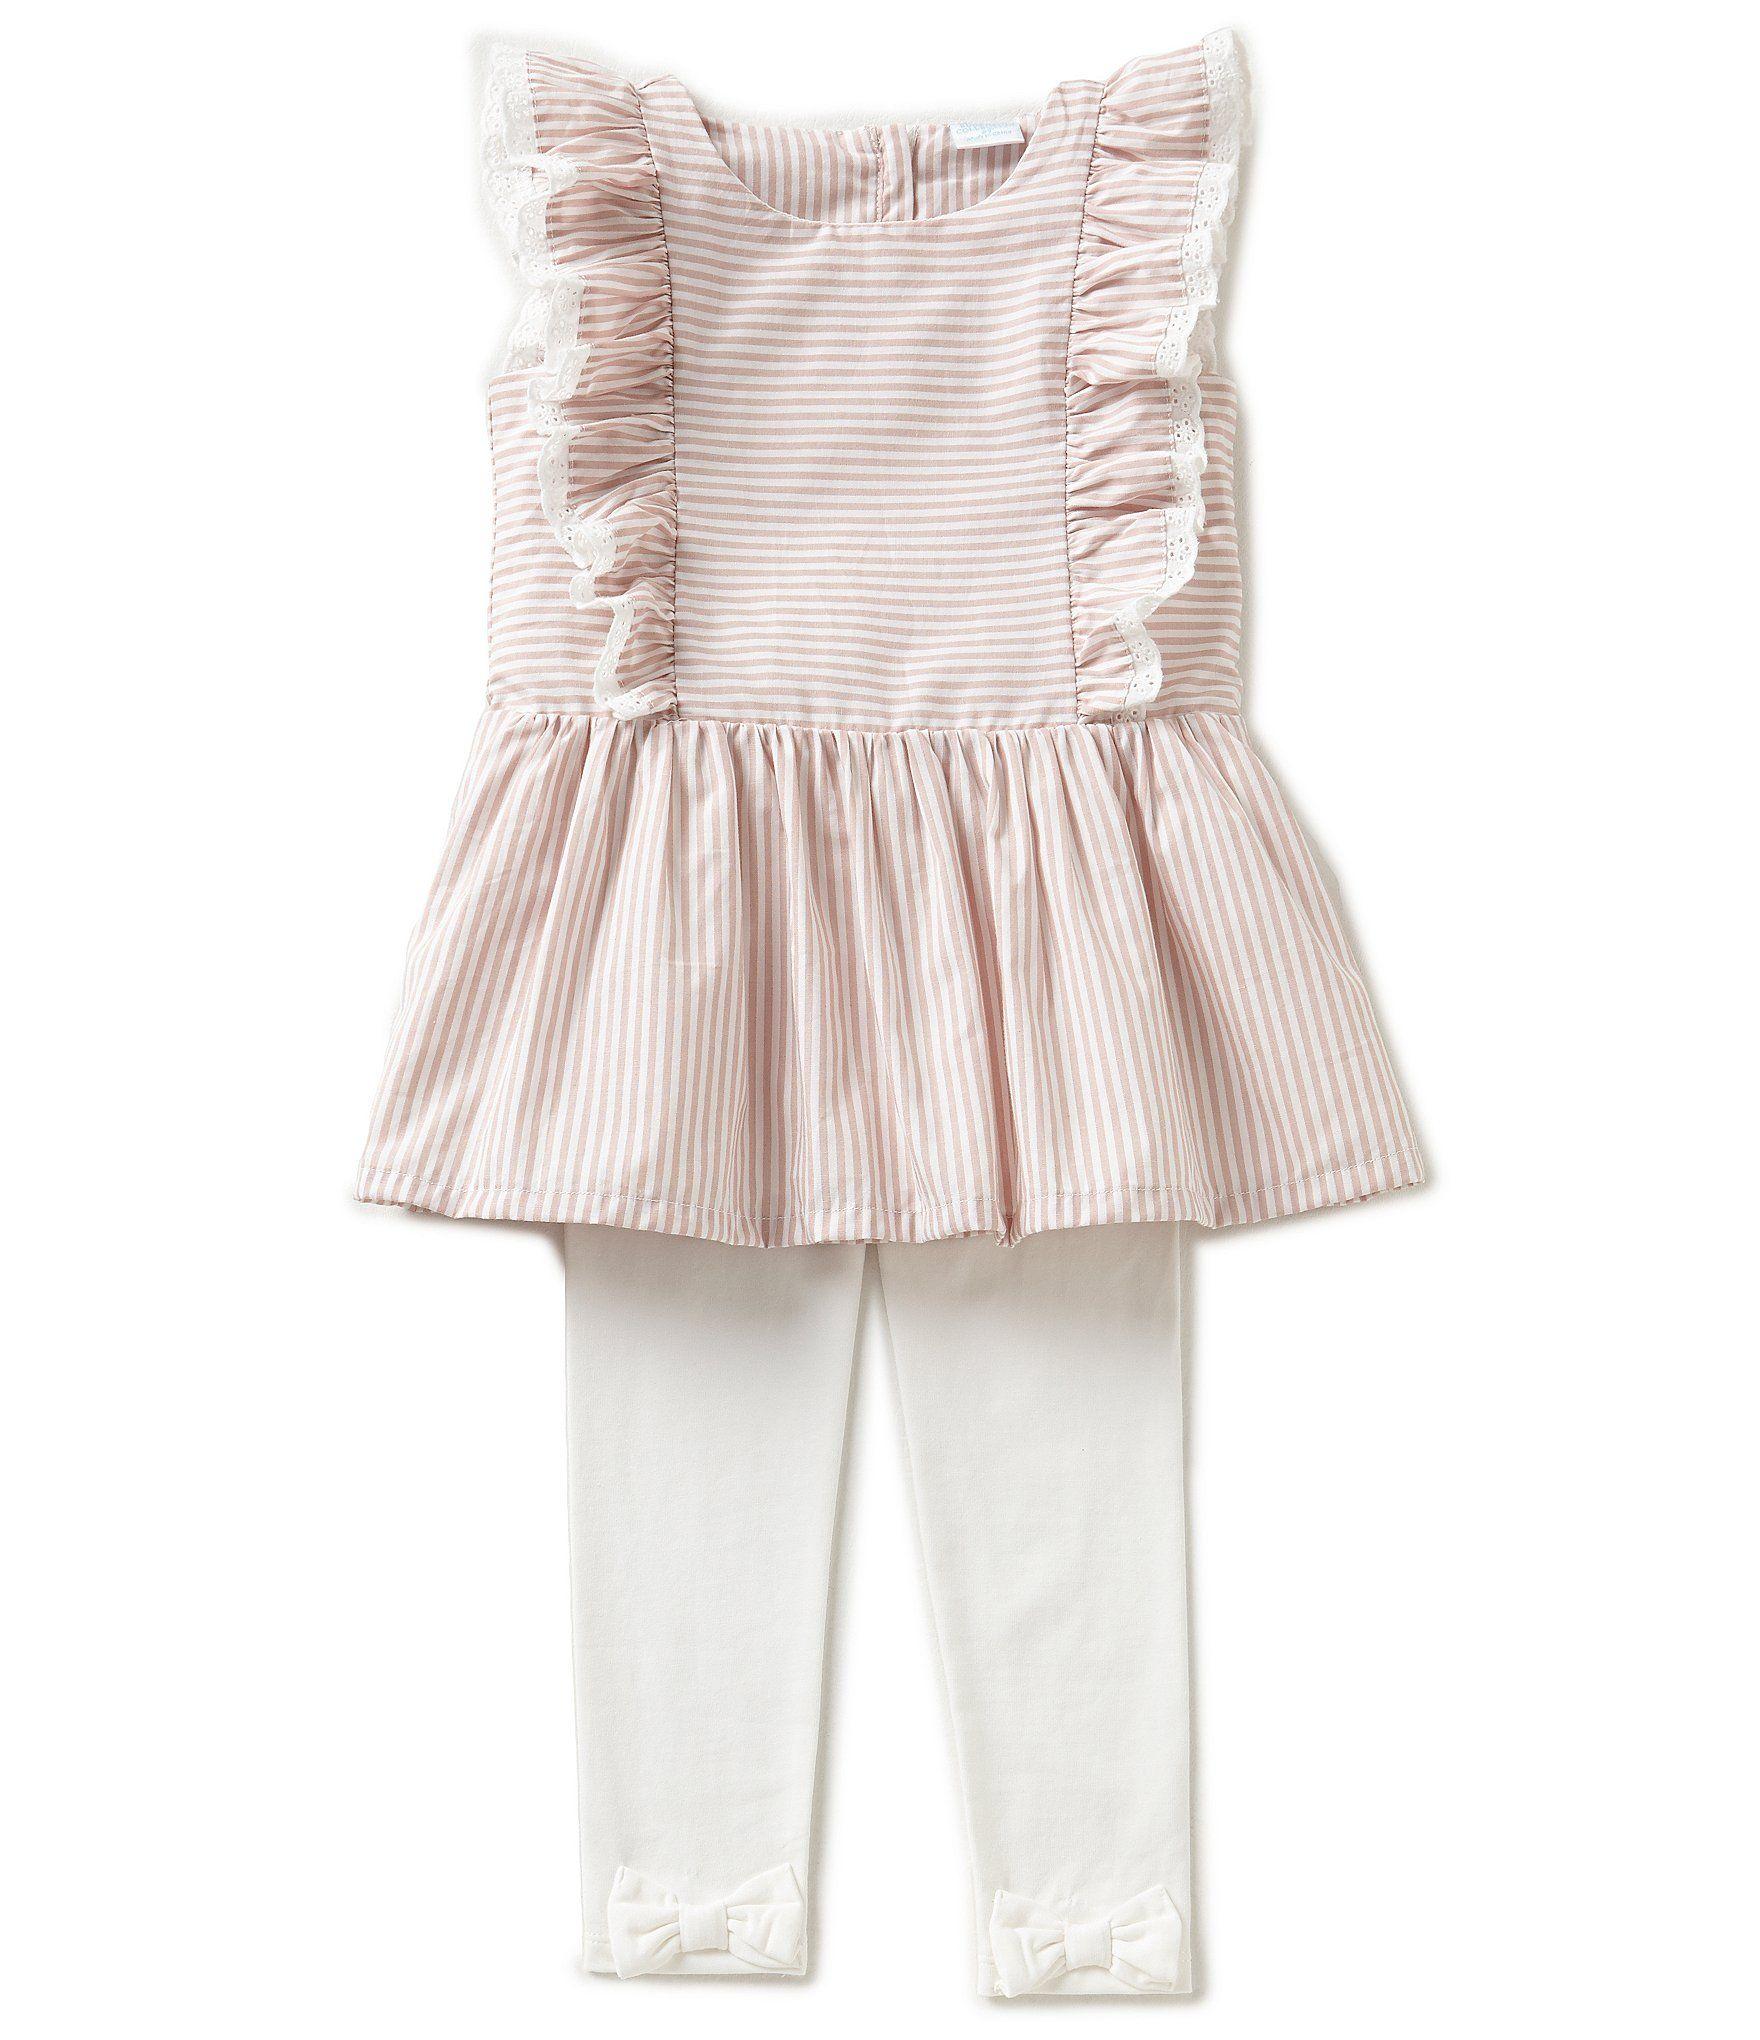 2fcc58d9010 Edgehill Collection Little Girls 2T-4T Striped Flutter-Sleeve Top   Bow  Leggings Set